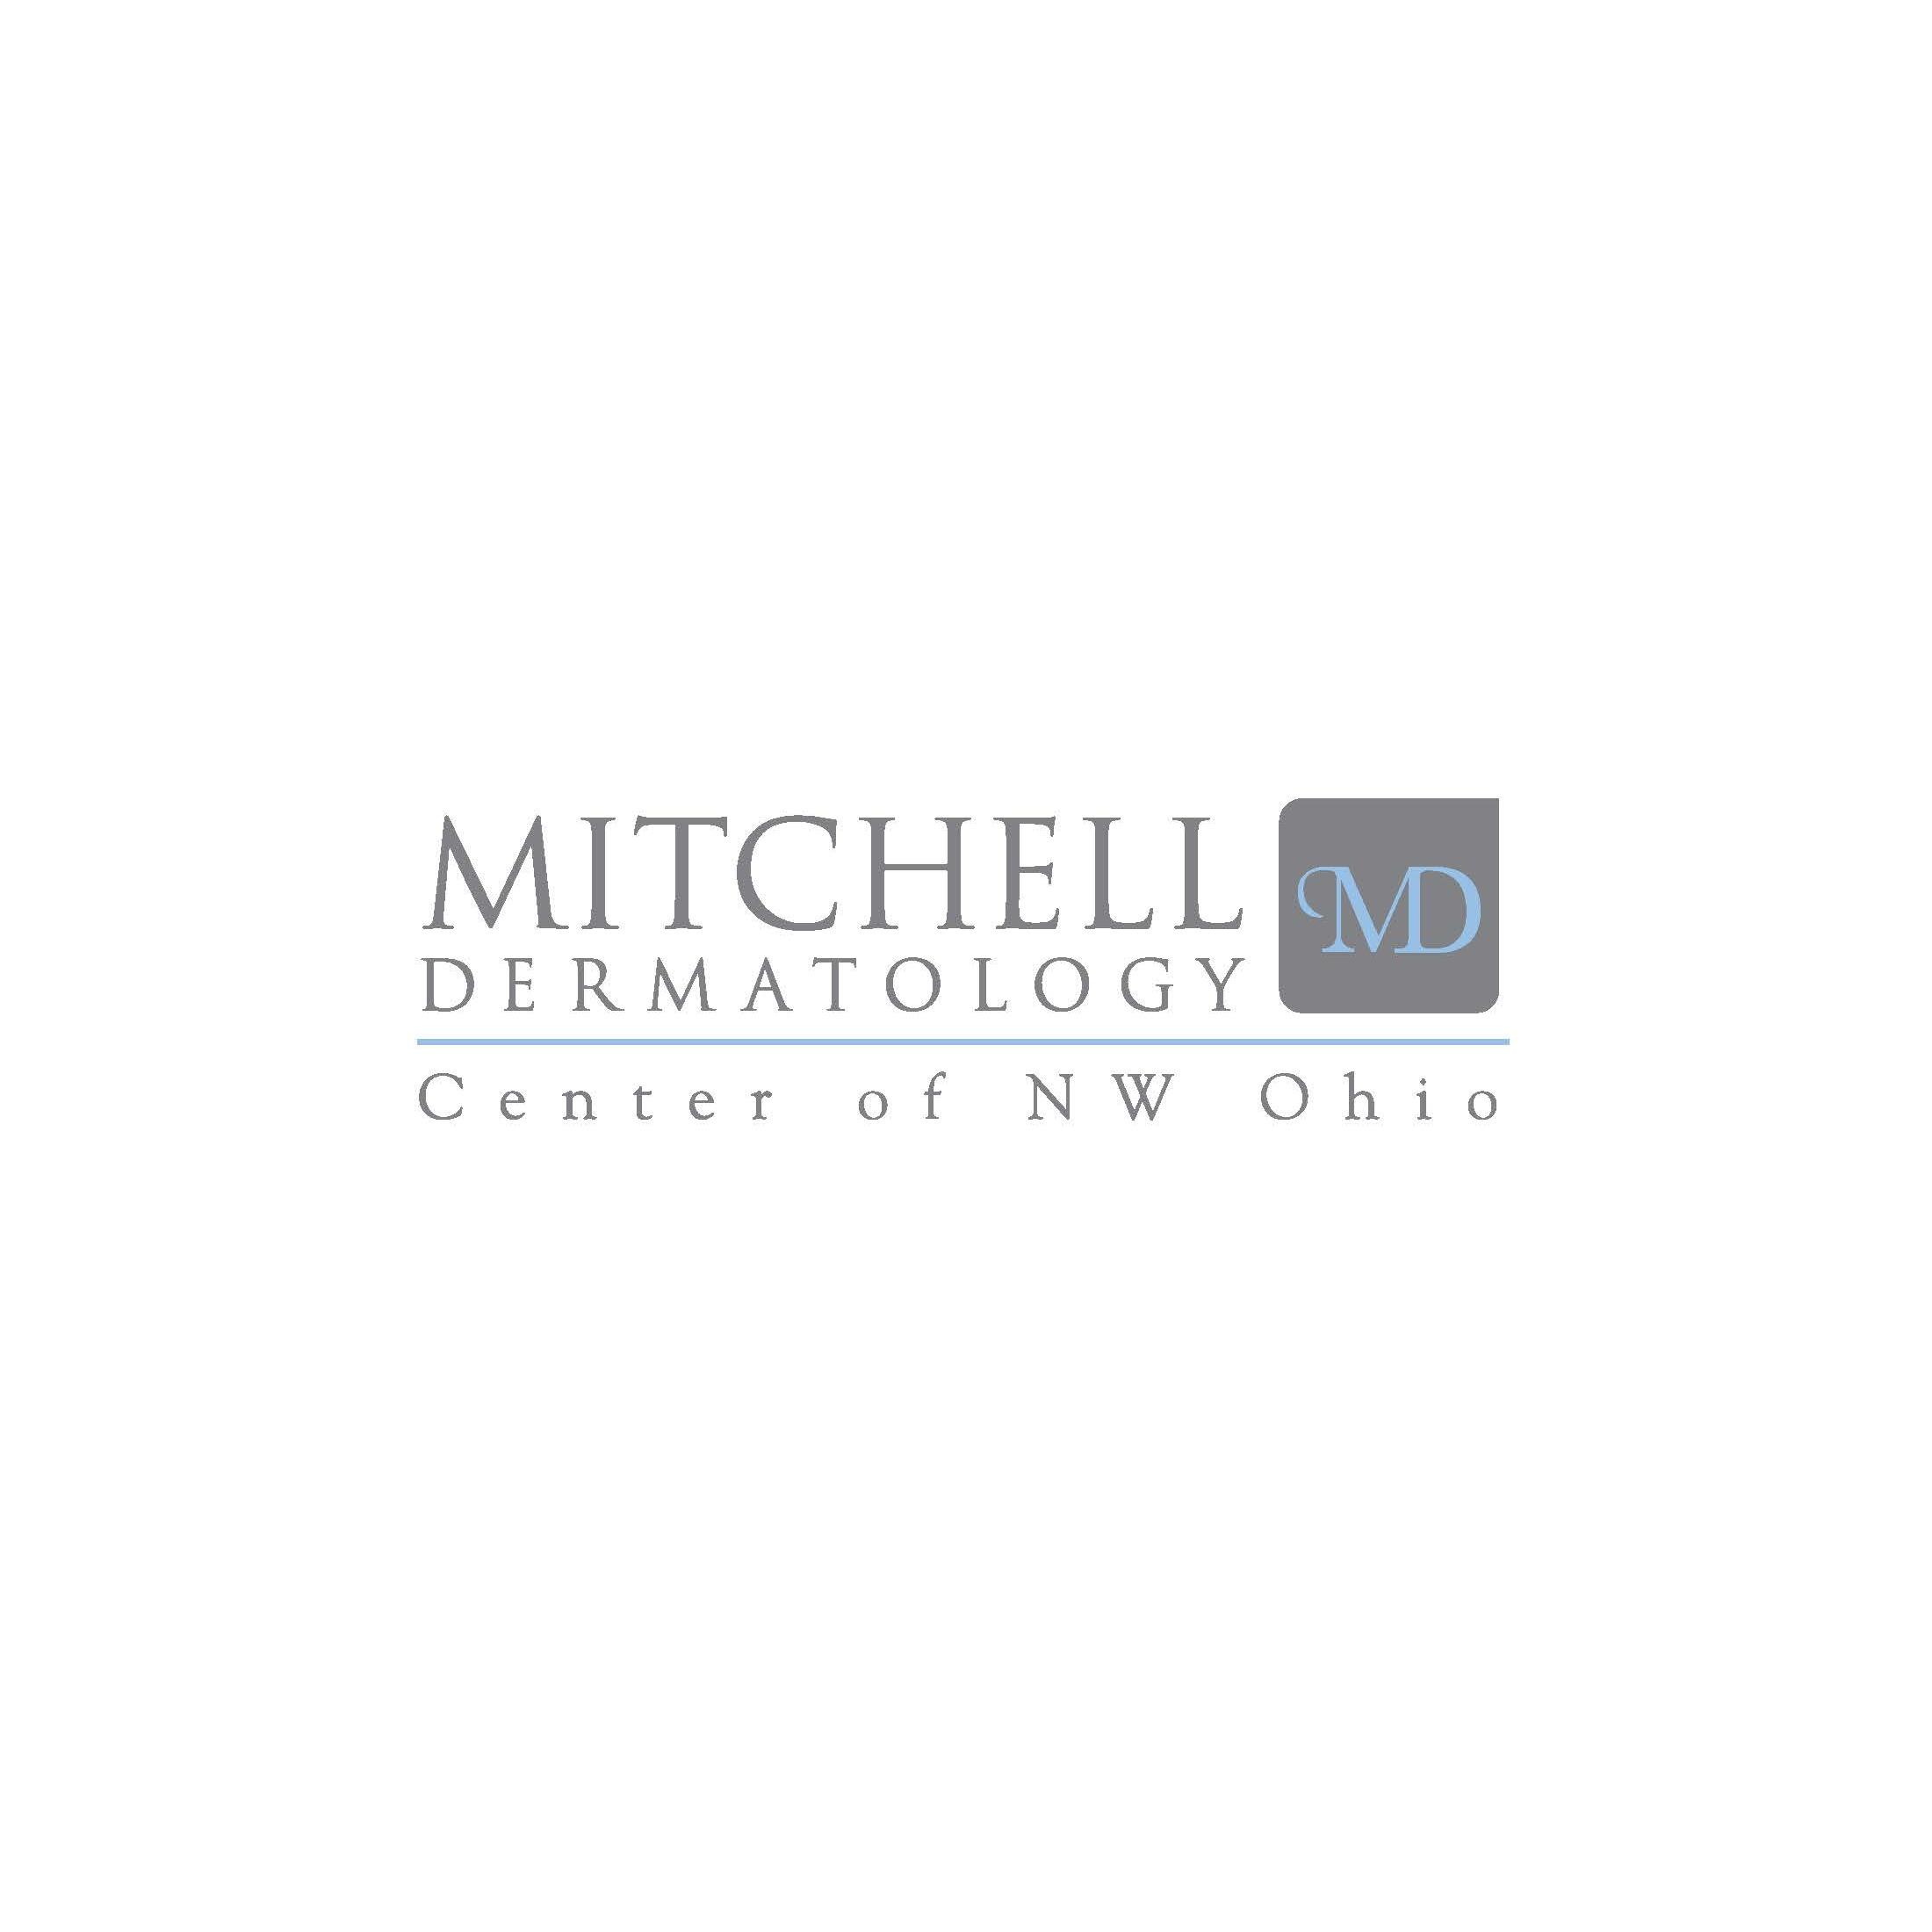 Mitchell Dermatology - Perrysburg, OH - Dermatologists